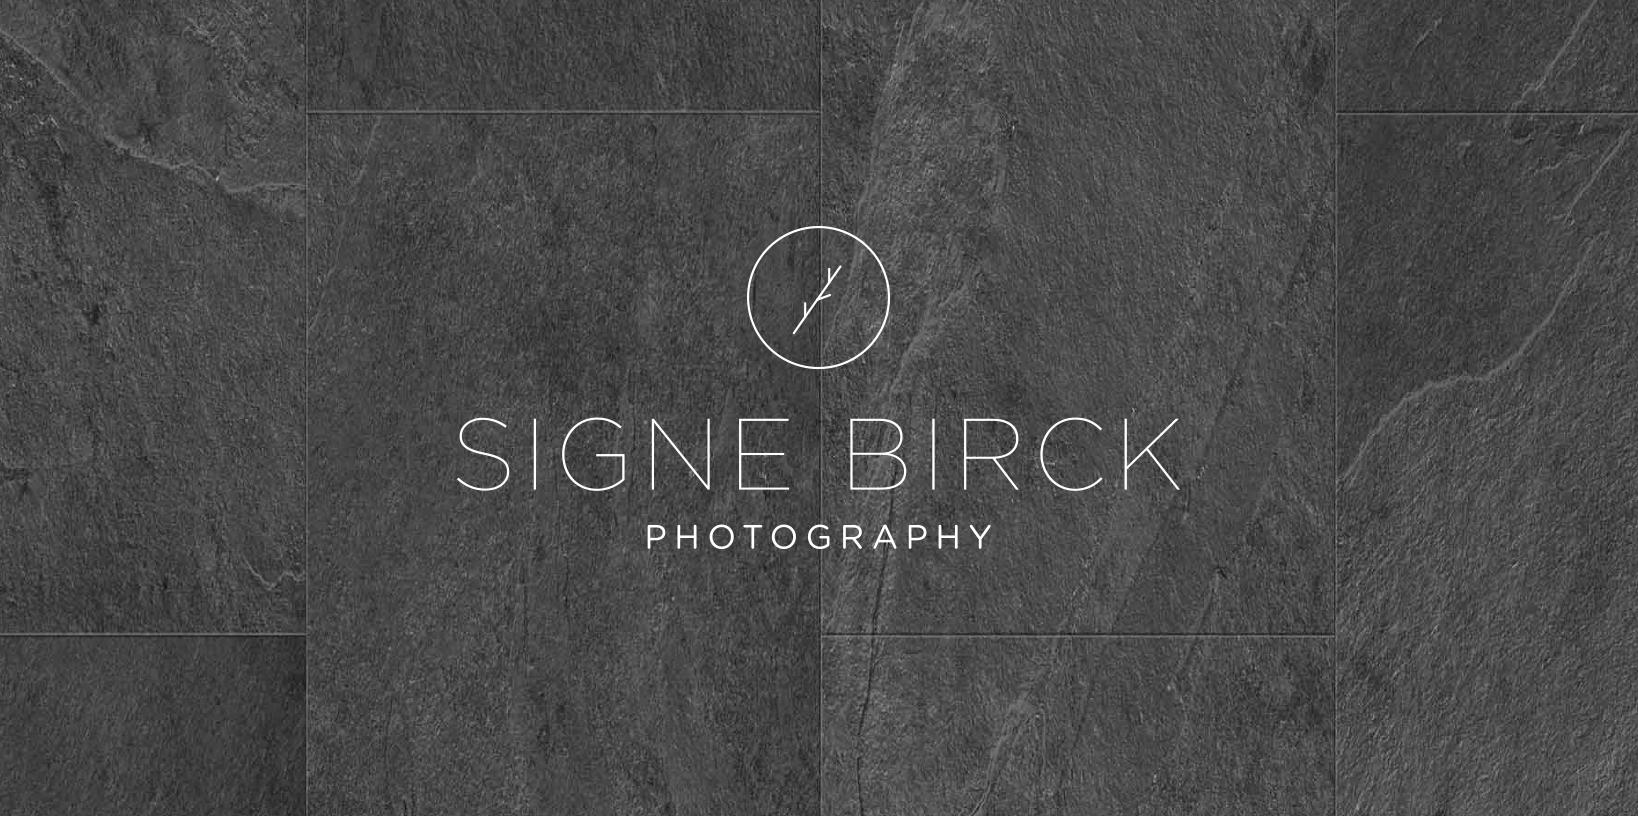 SigneBirck_logo.jpg